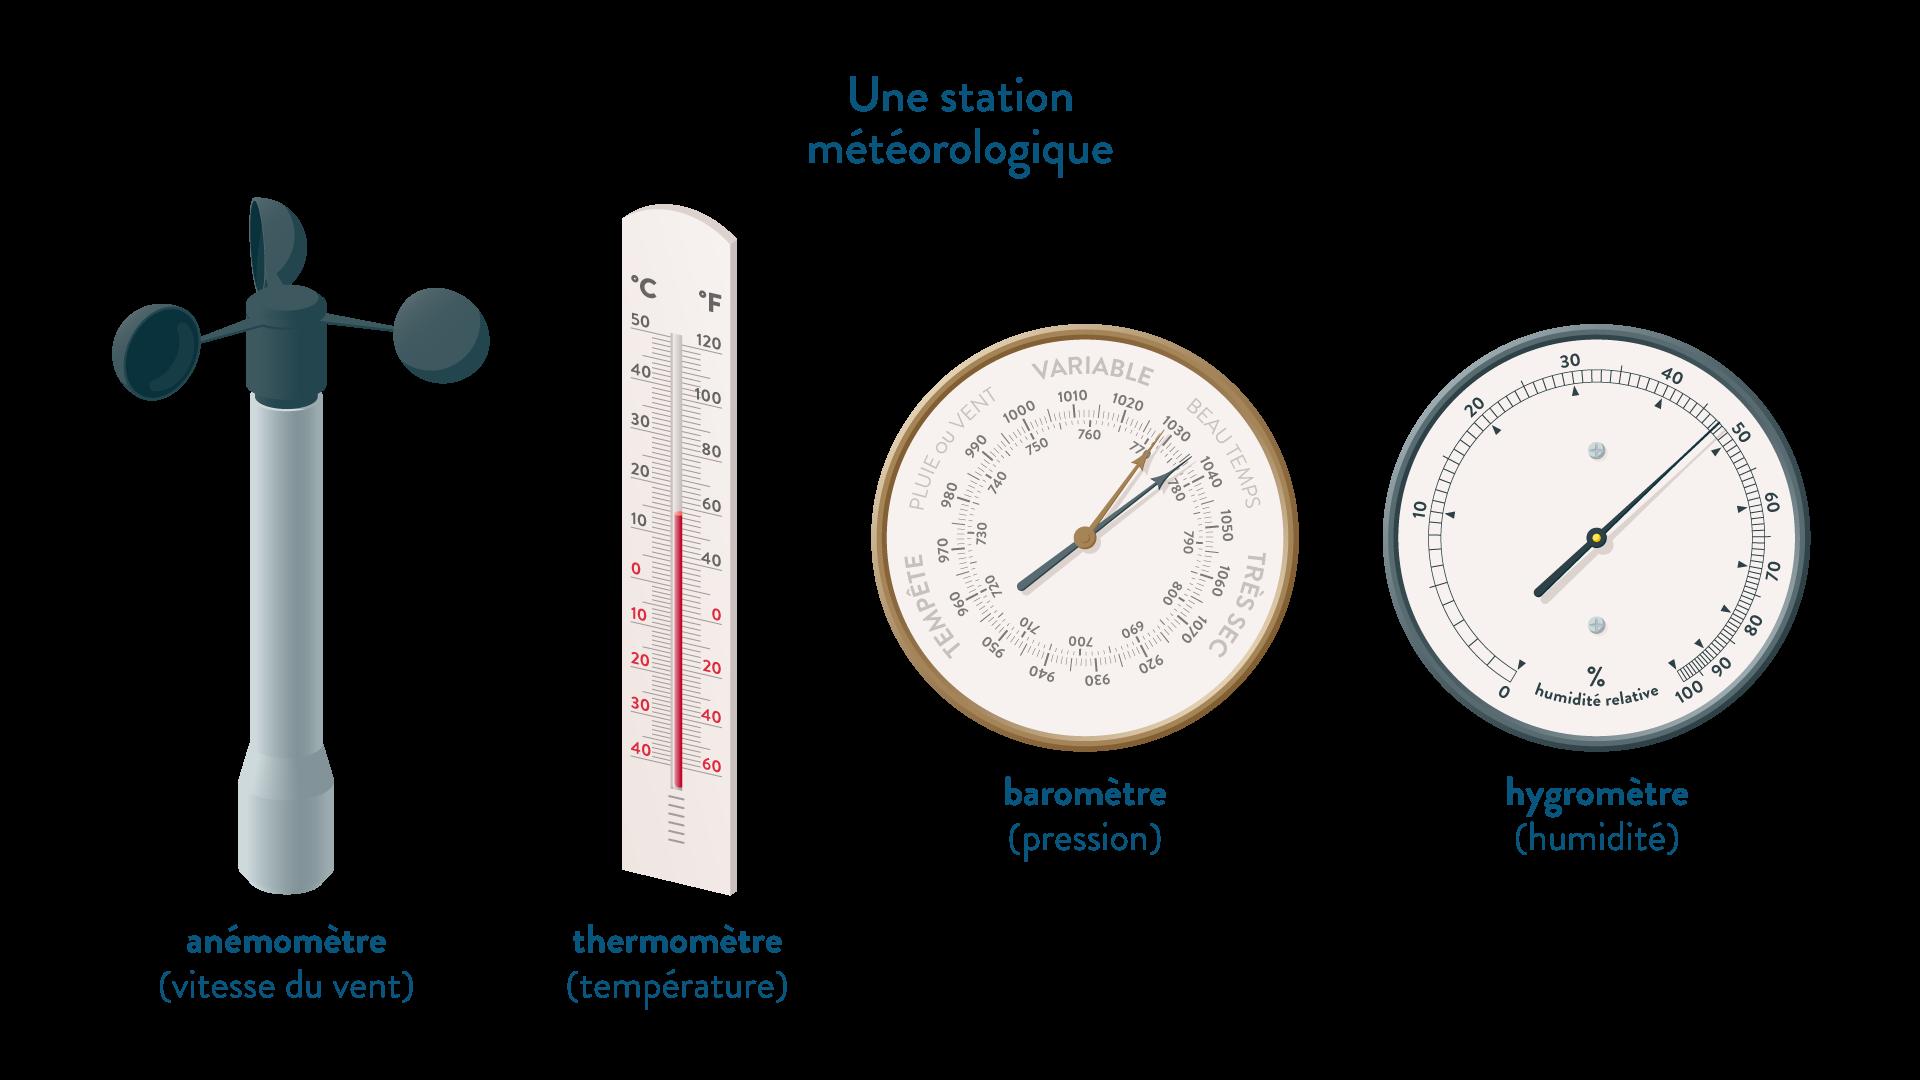 Une station météorologie-svt-6e-schoolmouv